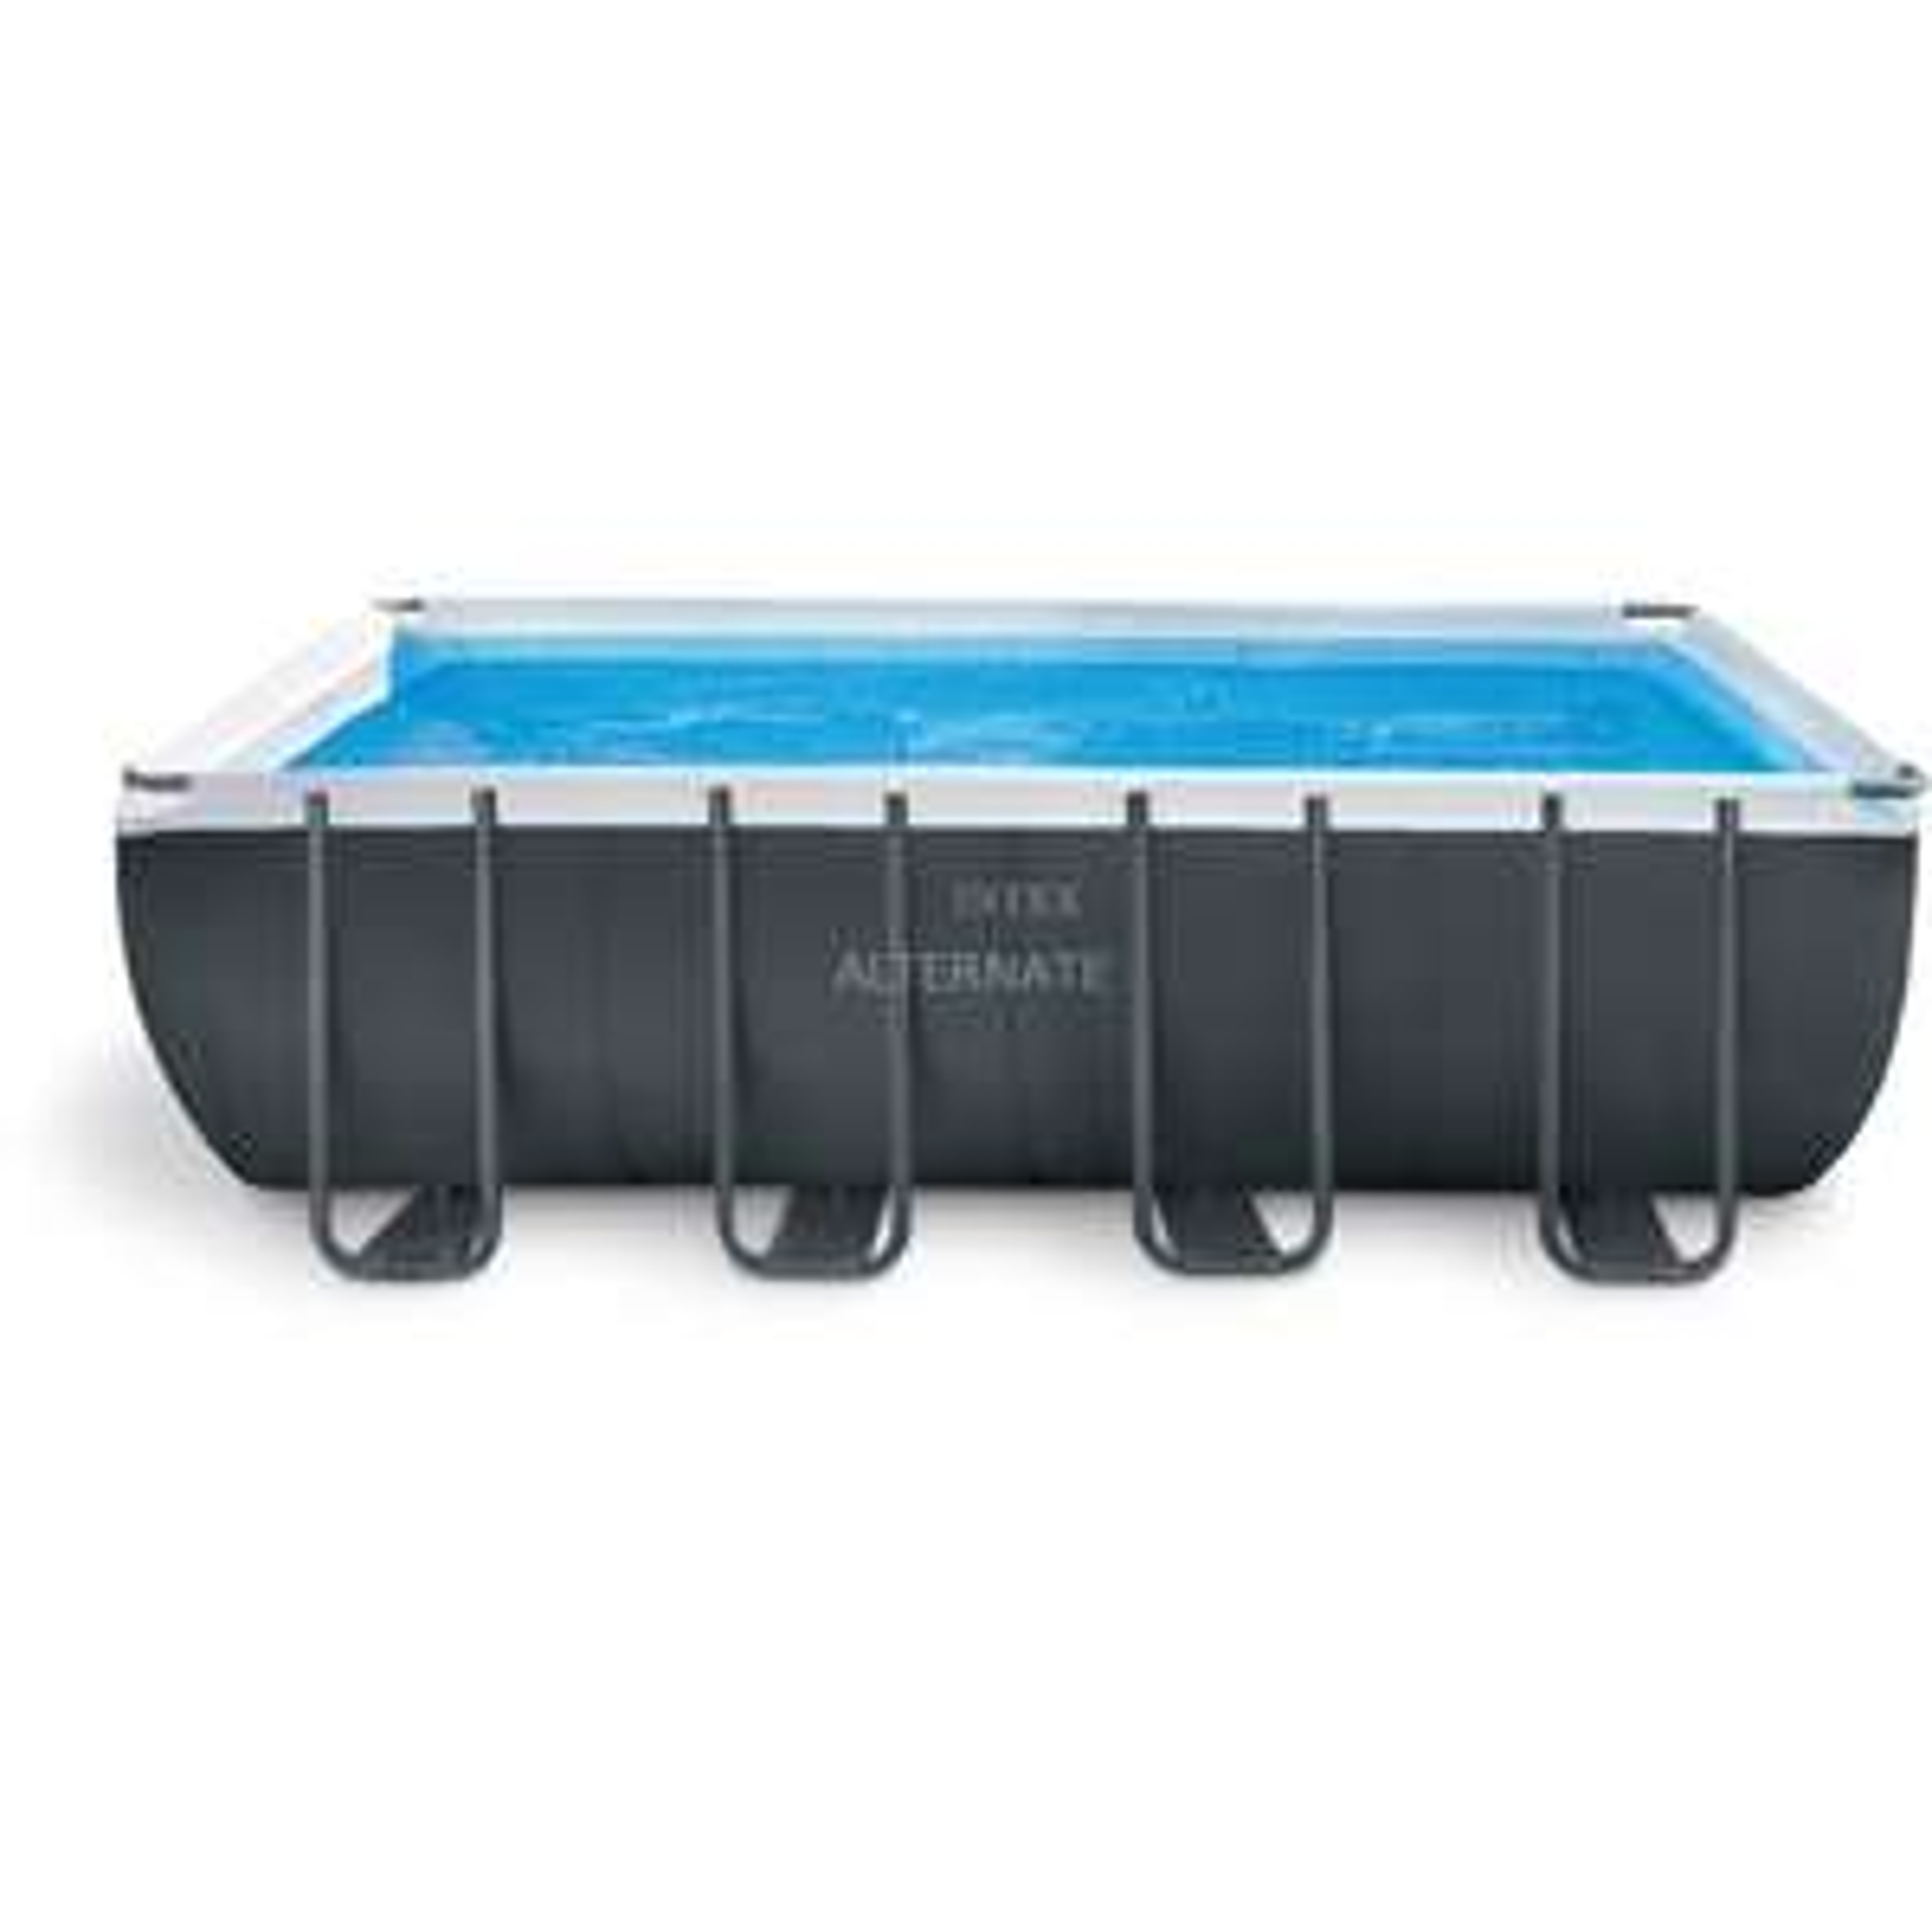 Alternate: IntexFrame Pool Set Ultra Quadra XTR 549 x 274 x 132cm